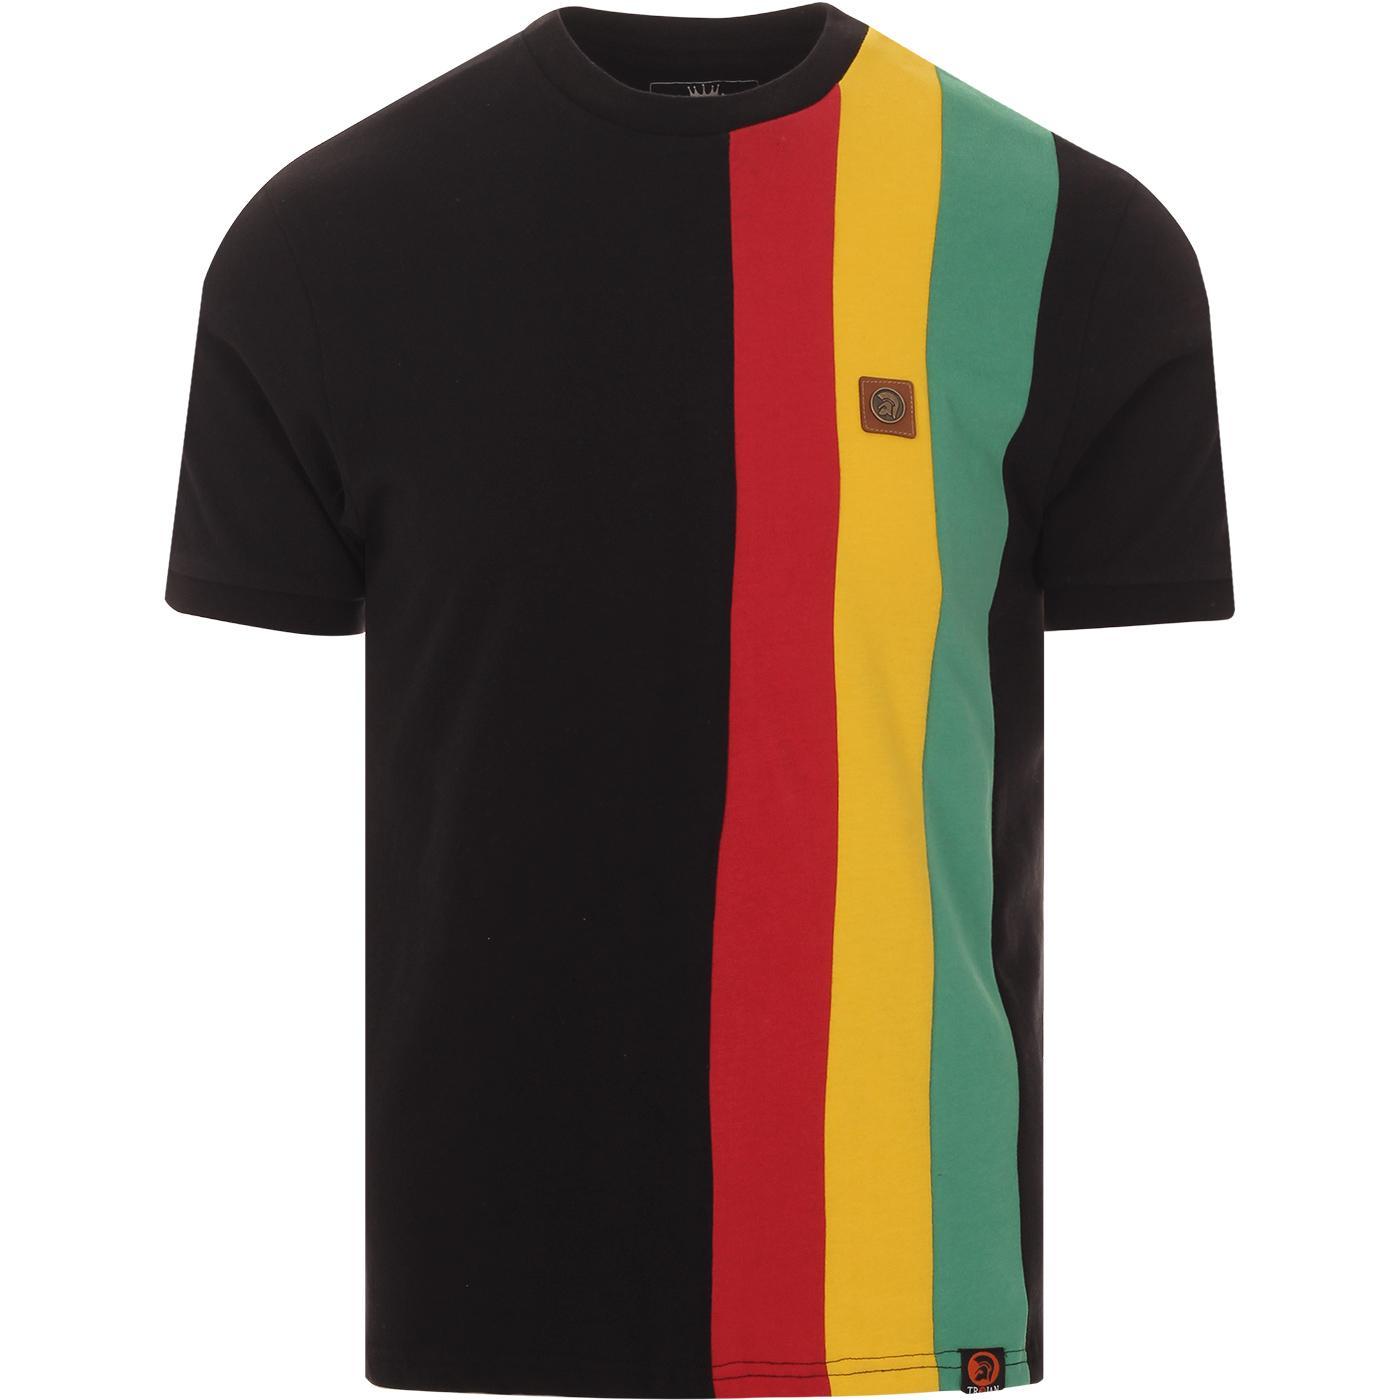 TROJAN RECORDS Cut & Sew Rasta Racing Stripe Tee